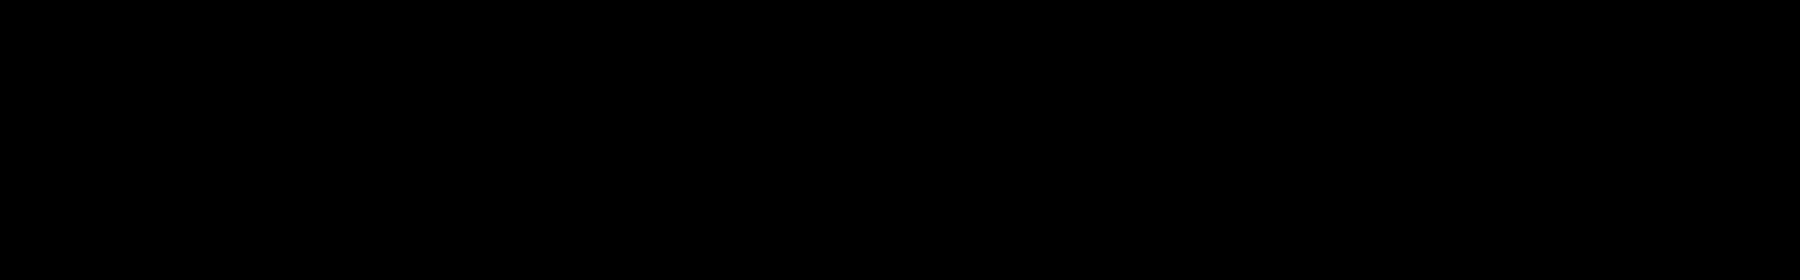 808 Trill - Xfer Serum Presets audio waveform